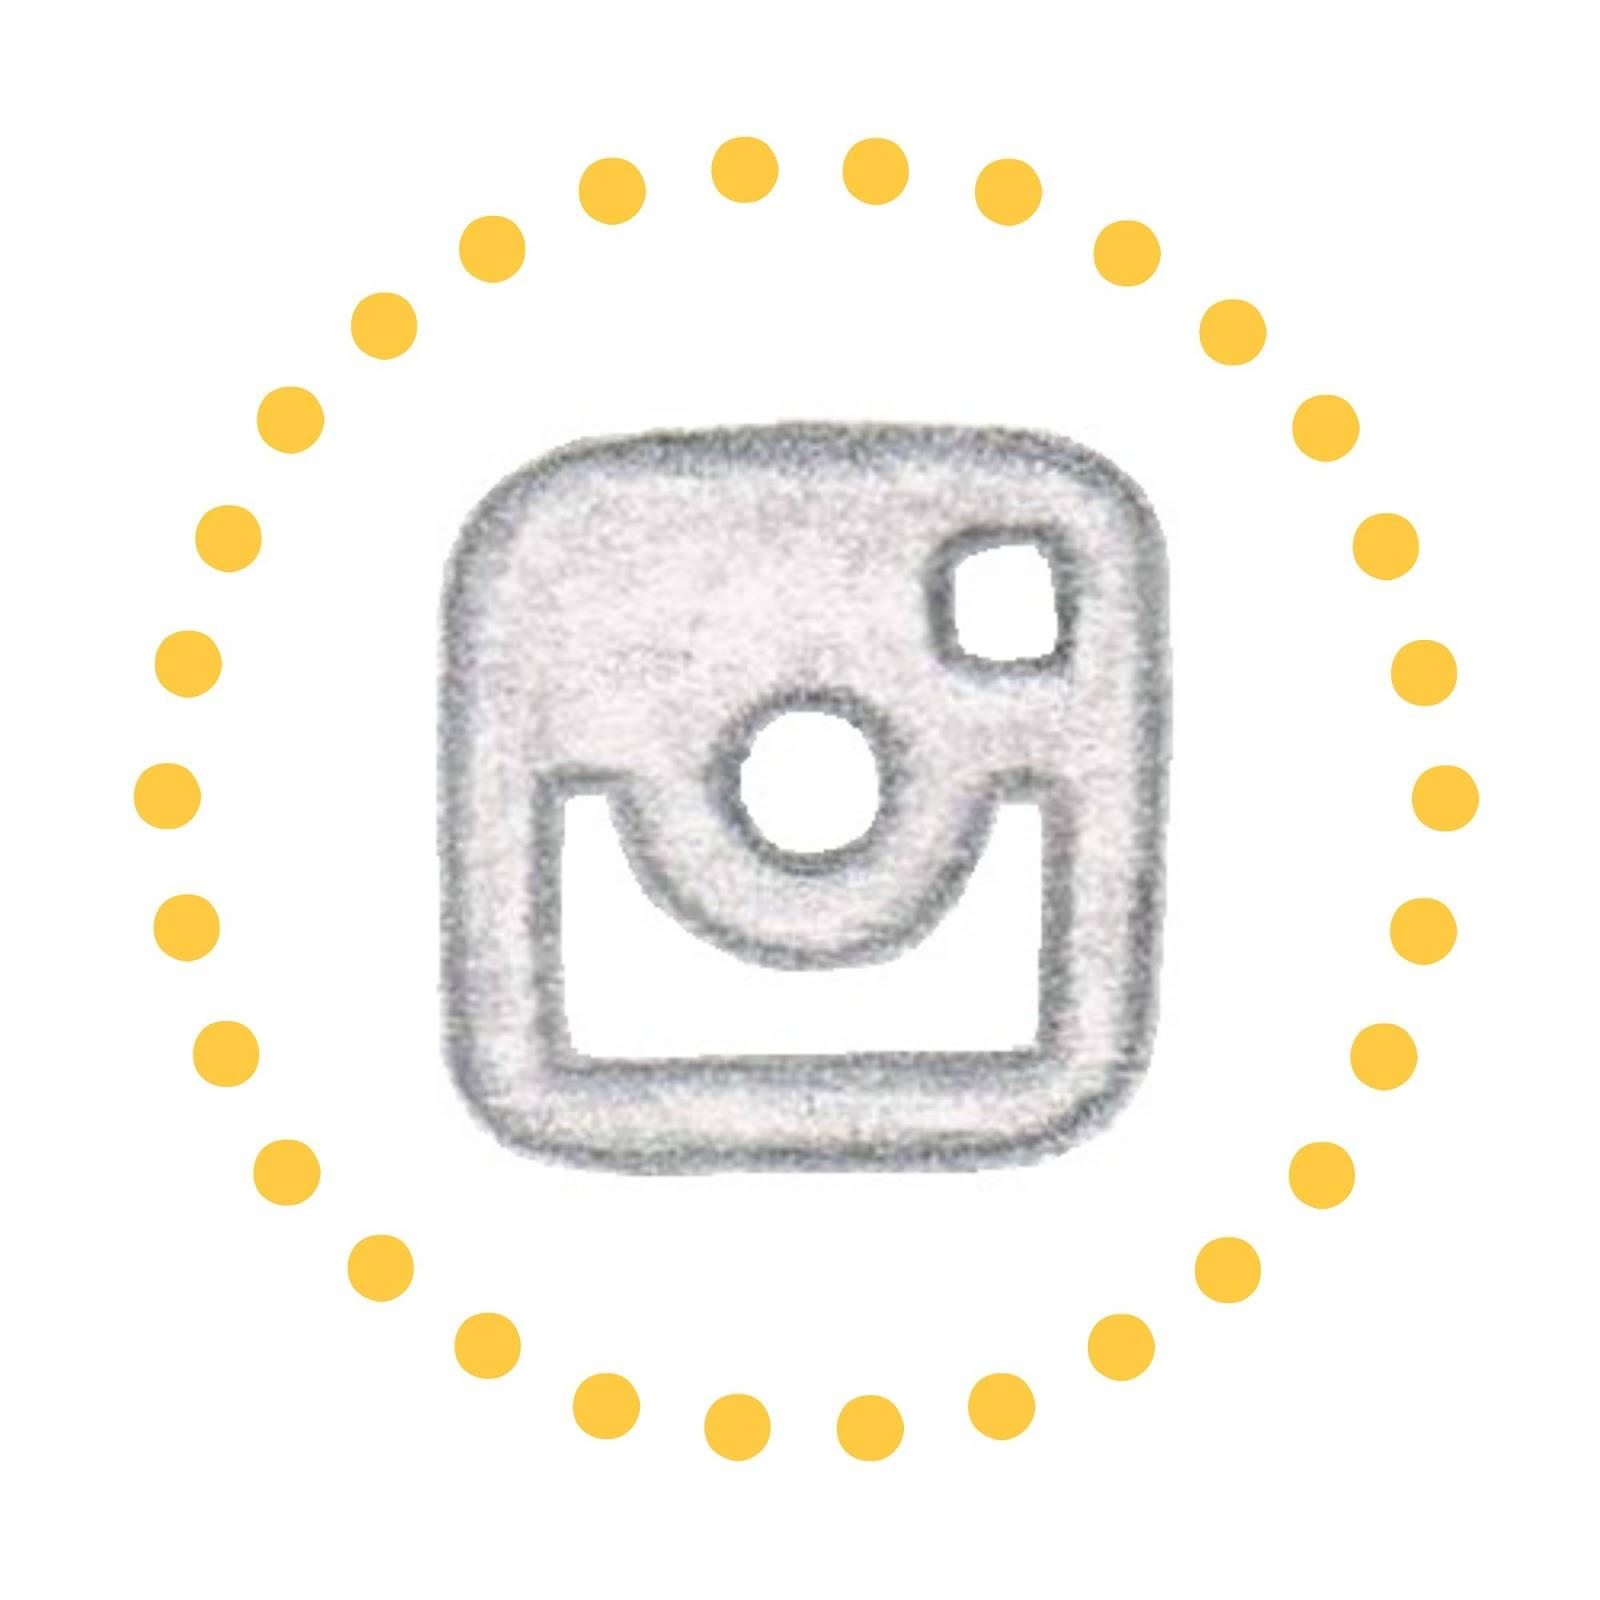 http://instagram.com/lulucbb/